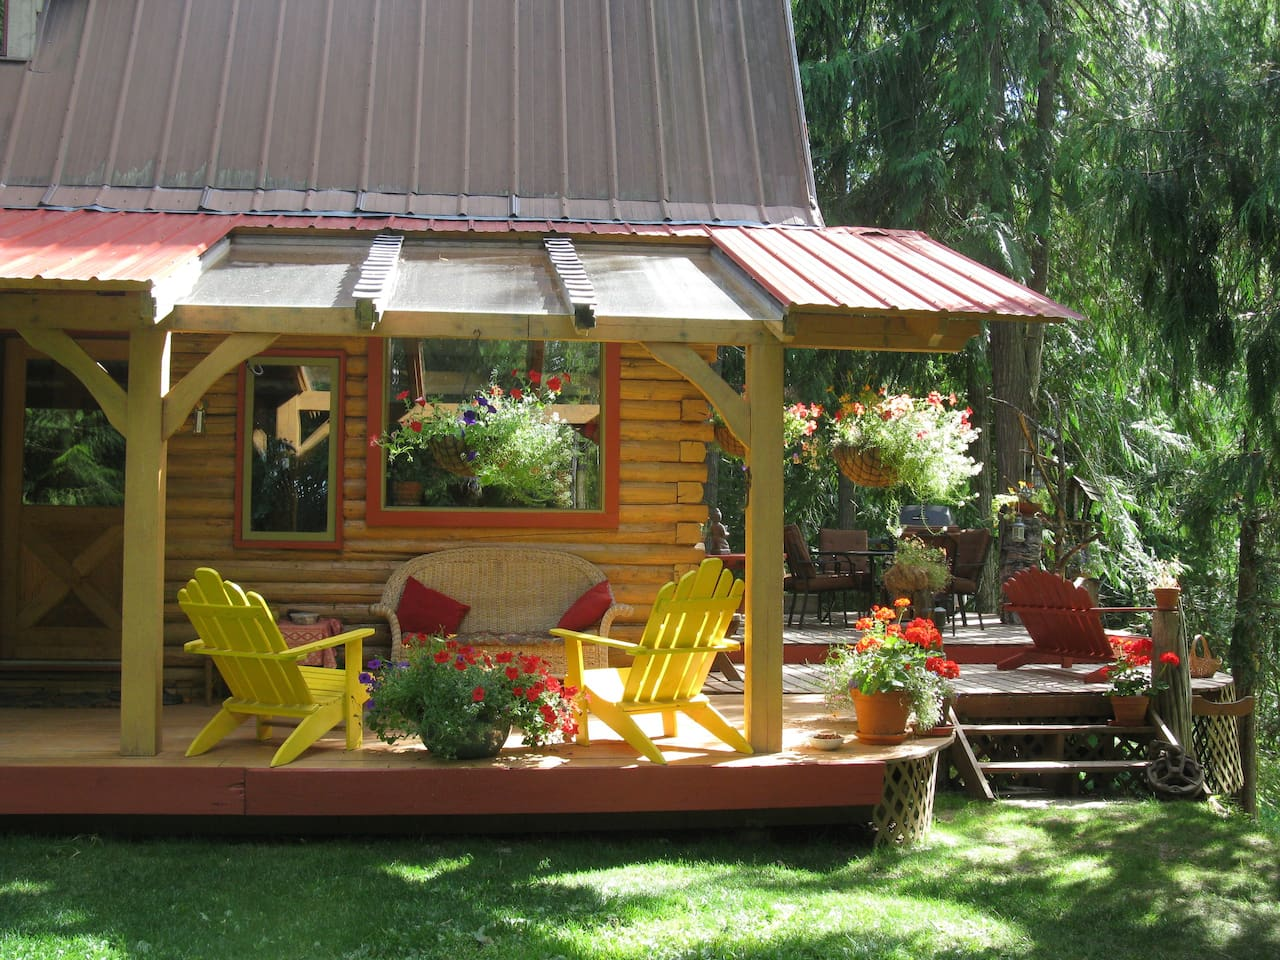 Kaslo Getaway - Houses for Rent in Kaslo, British Columbia, Canada